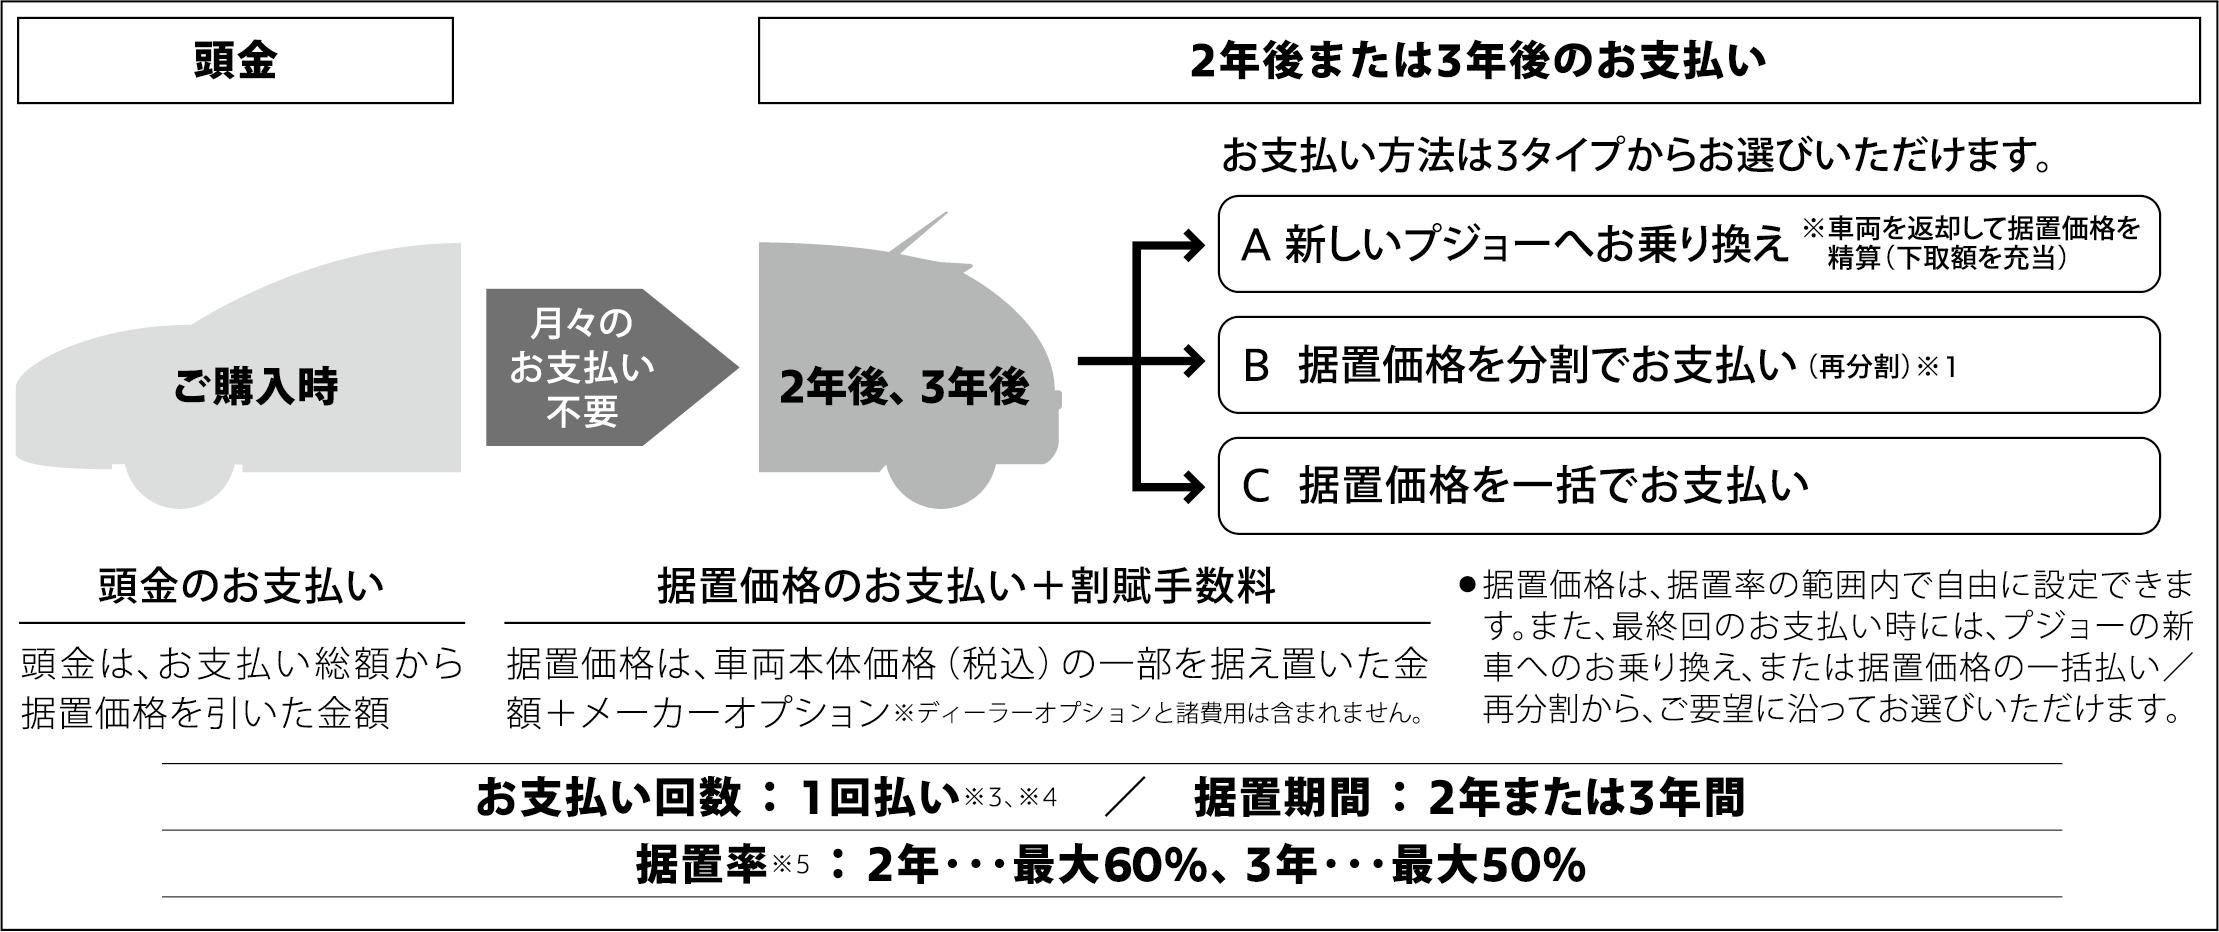 PSA・ツーステップ・プラン